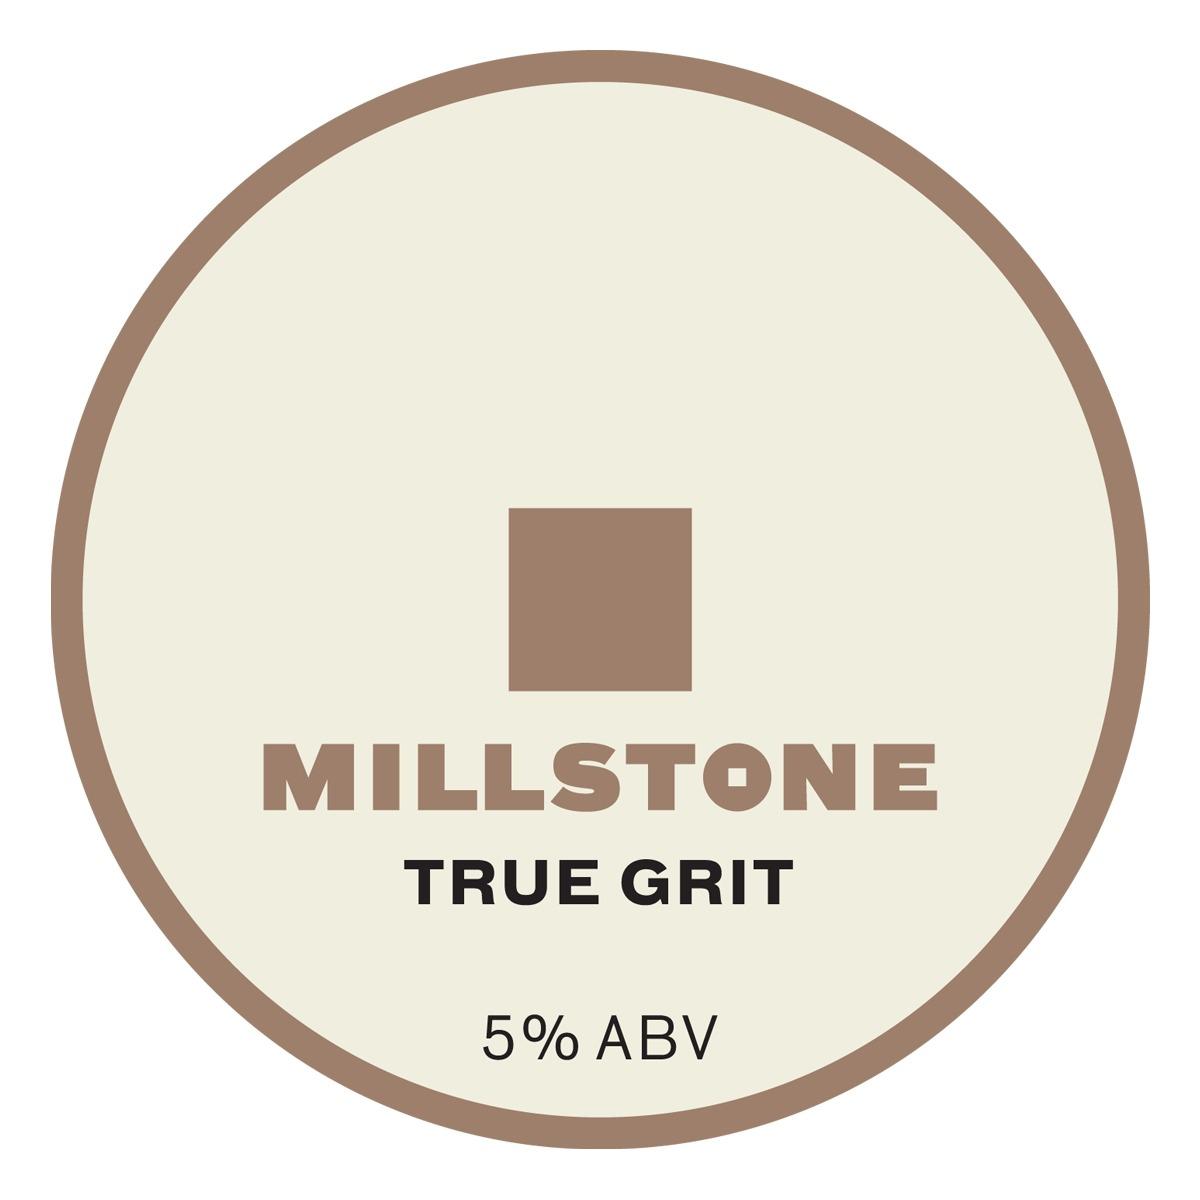 Millstone True Grit 9 Gallons Blonde 5.0%